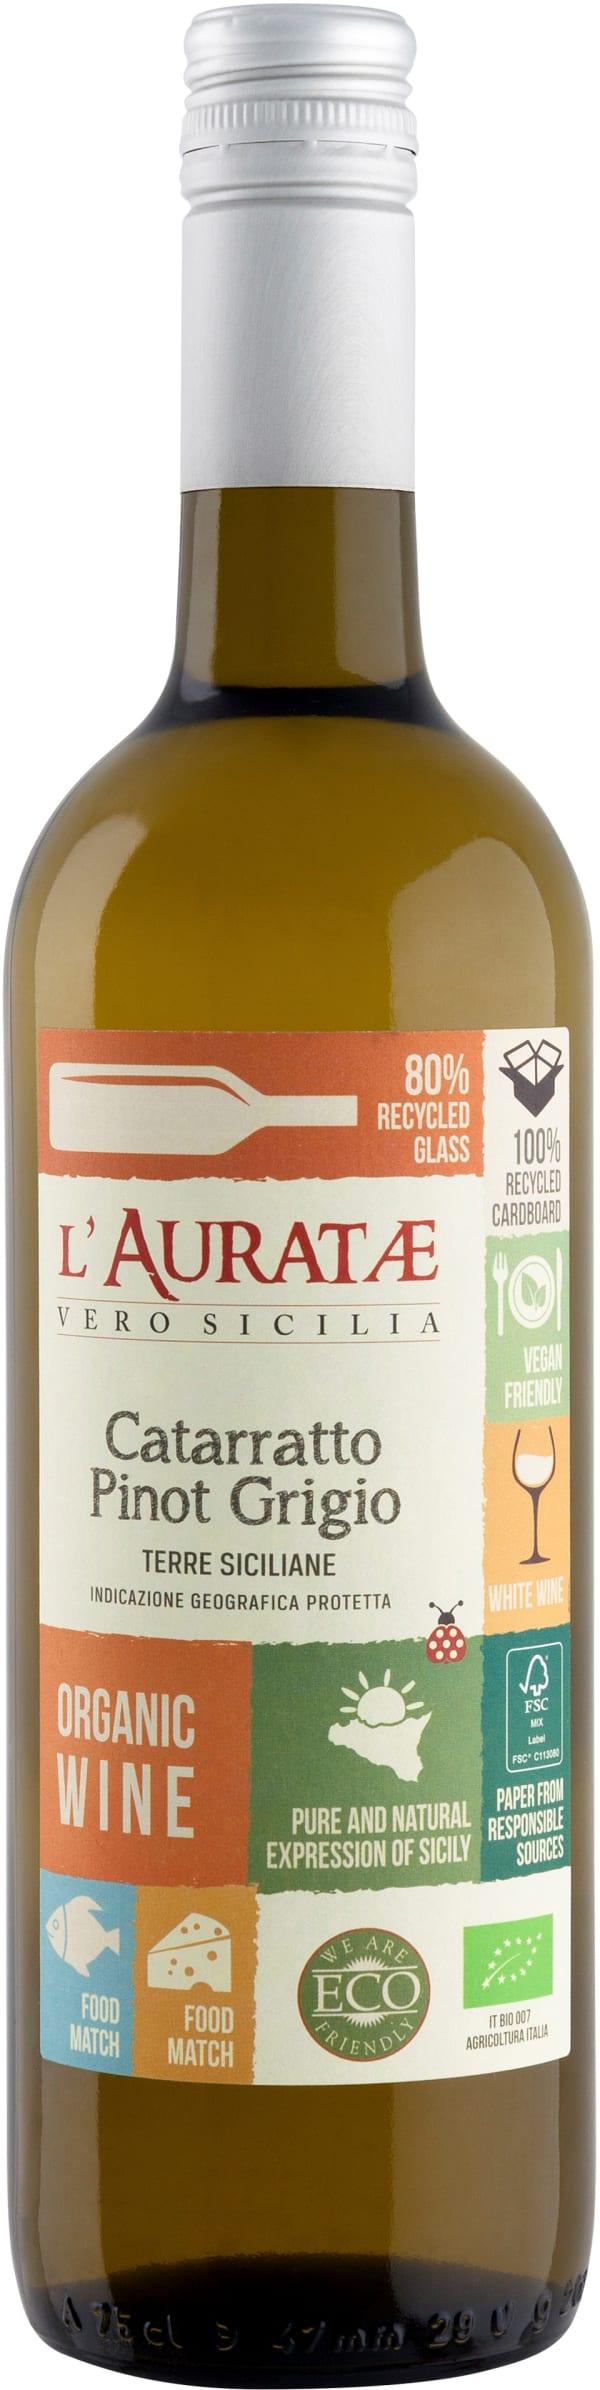 L'Auratae Organic Catarratto Pinot Grigio 2019